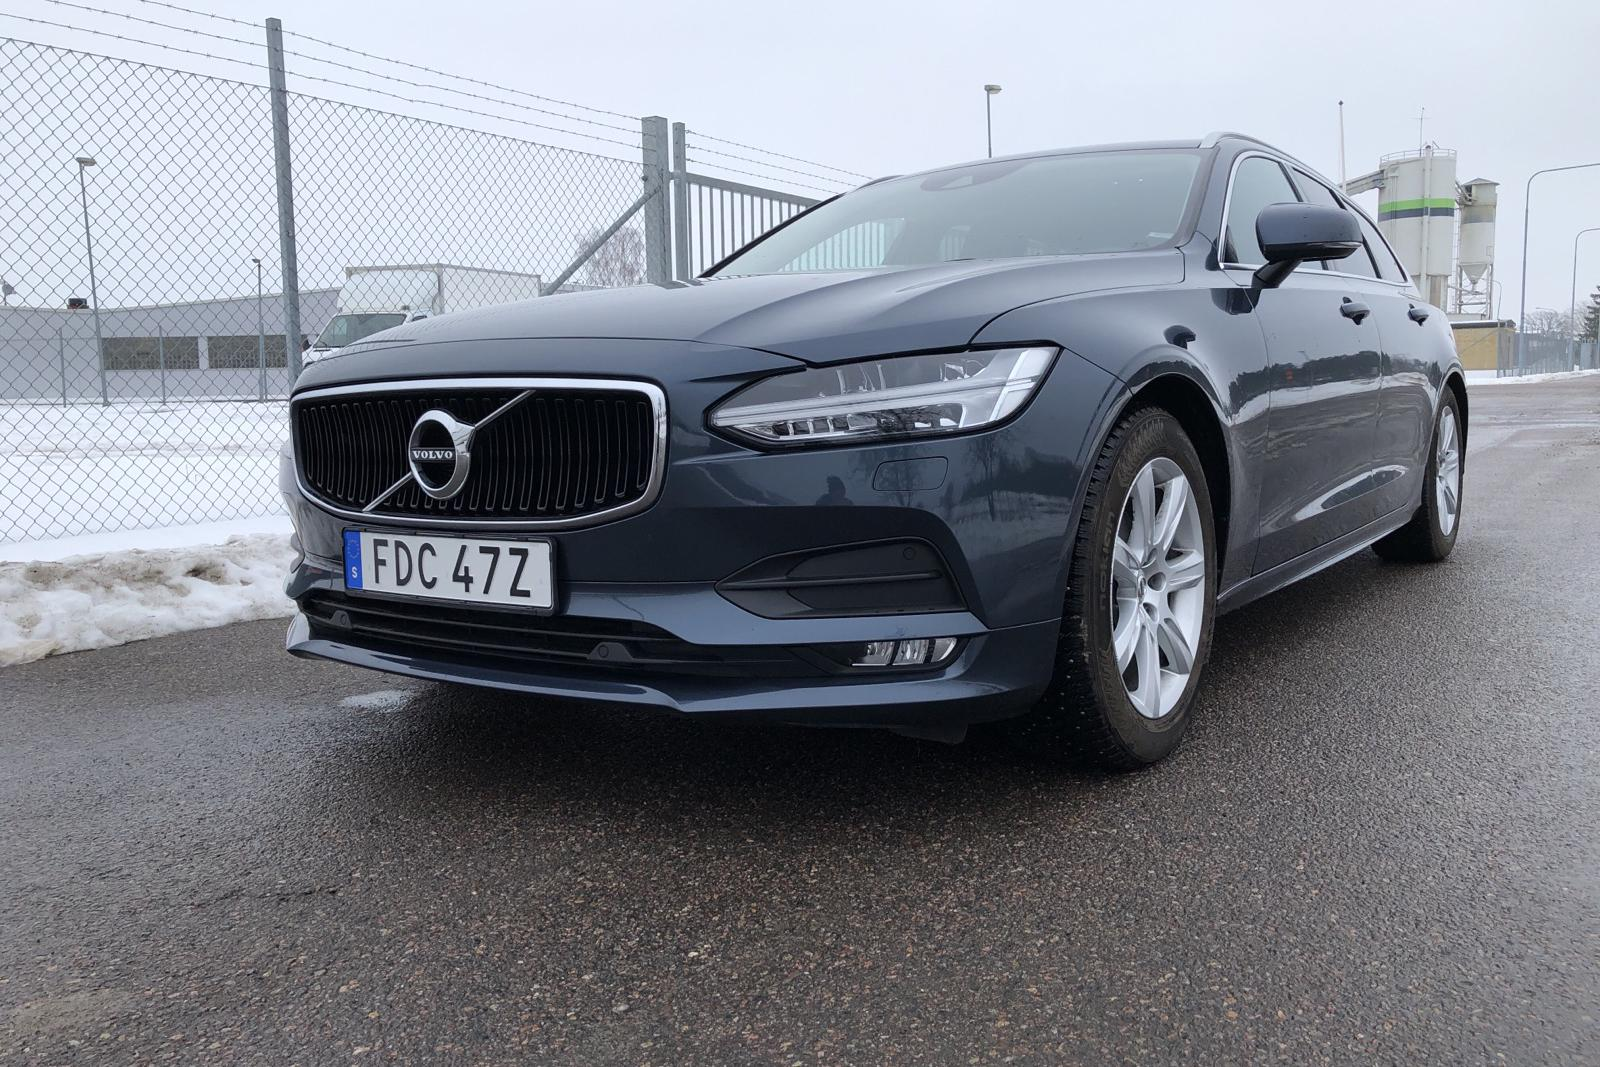 Volvo V90 D4 (190hk) - 40 980 km - Automatic - Dark Blue - 2020